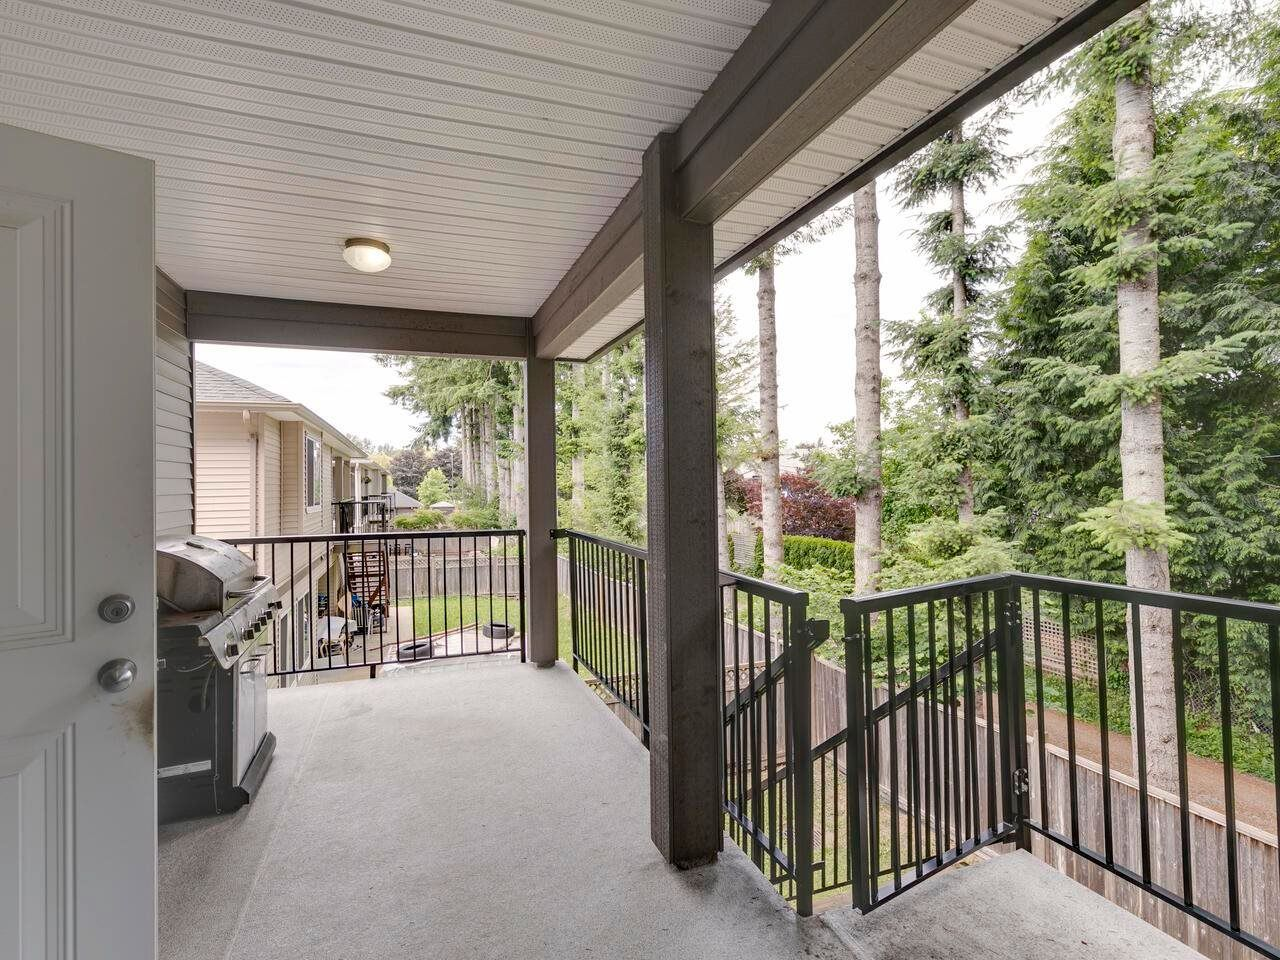 "Photo 16: Photos: 22845 126B Avenue in Maple Ridge: East Central House for sale in ""EAST CENTRAL MAPLE RIDGE"" : MLS®# R2594638"